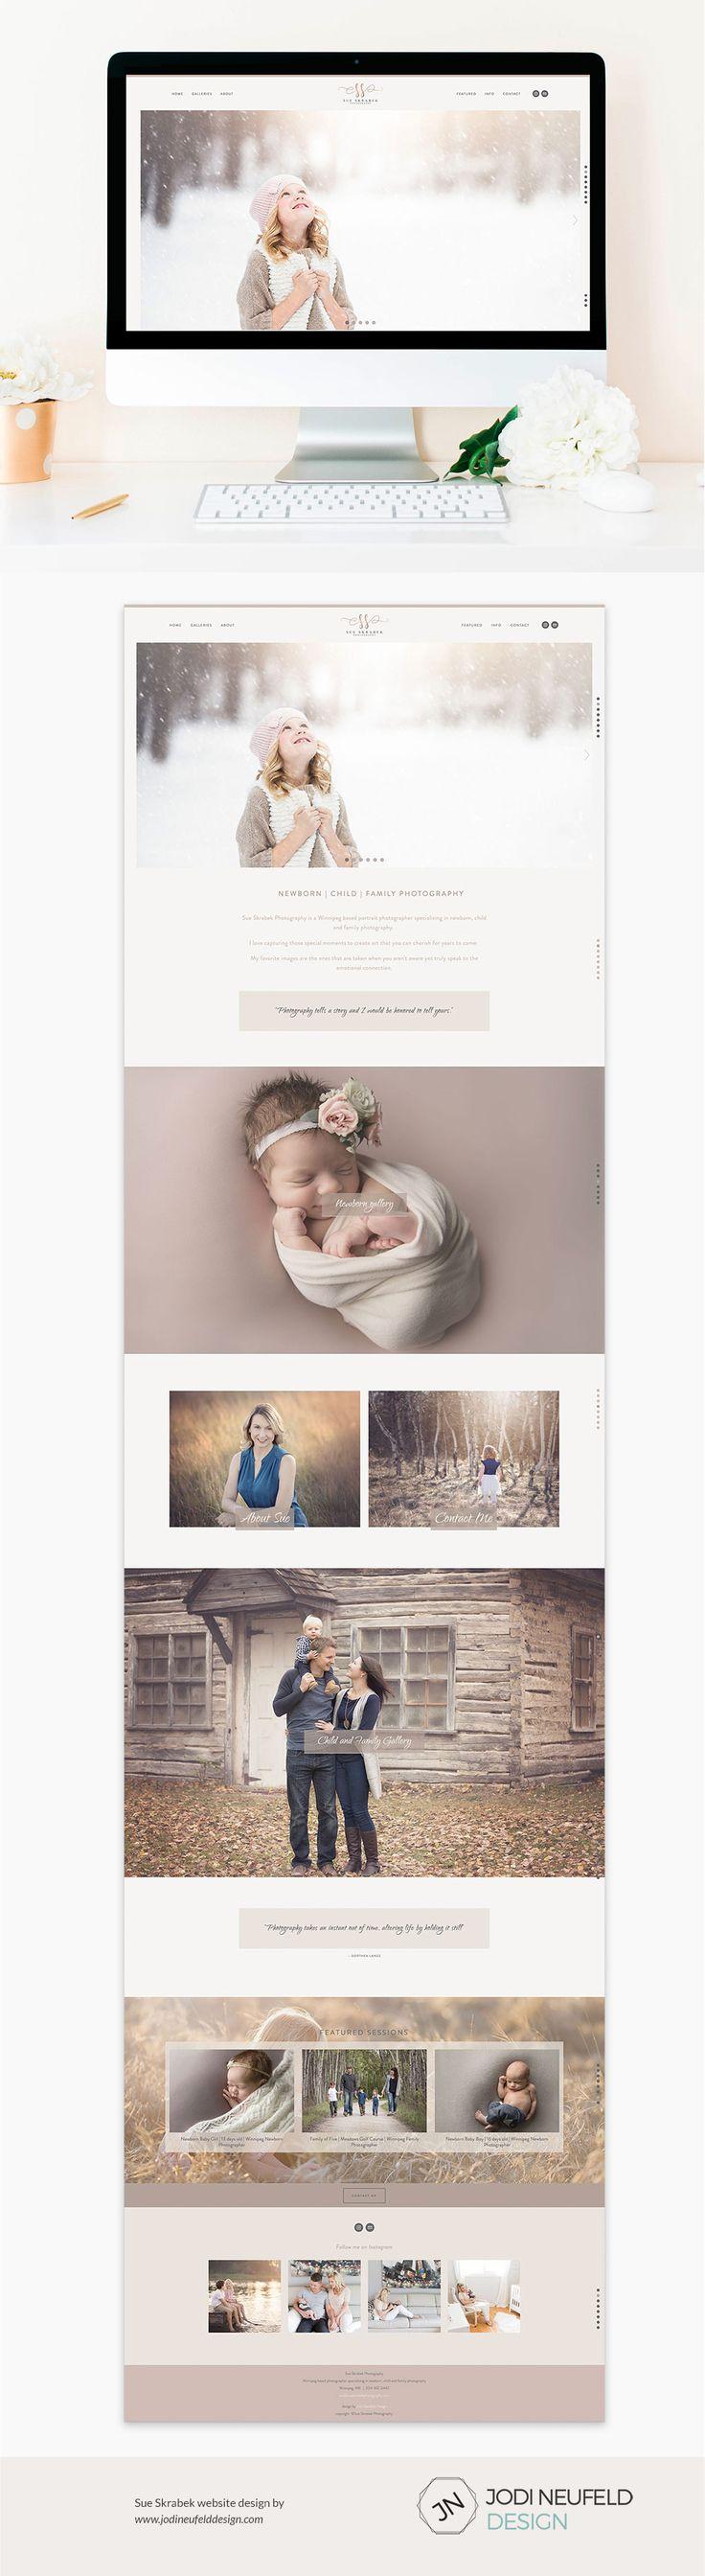 Sue Skrabek photography | Squarespace website by Jodi Neufeld Design